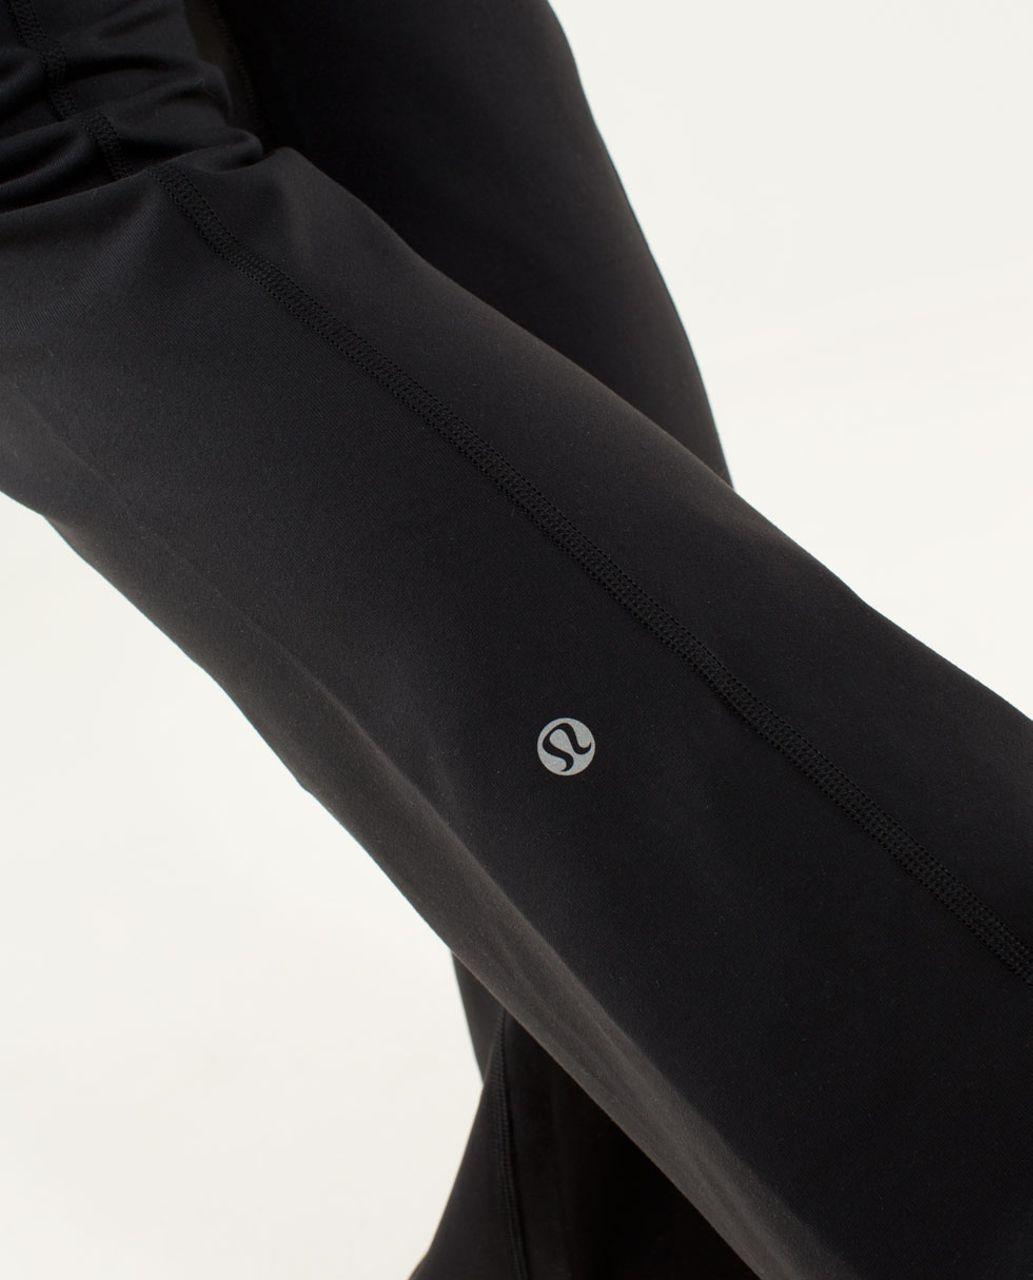 Lululemon Groove Pant (Regular) - Black / Quilt 03 Fall 2013